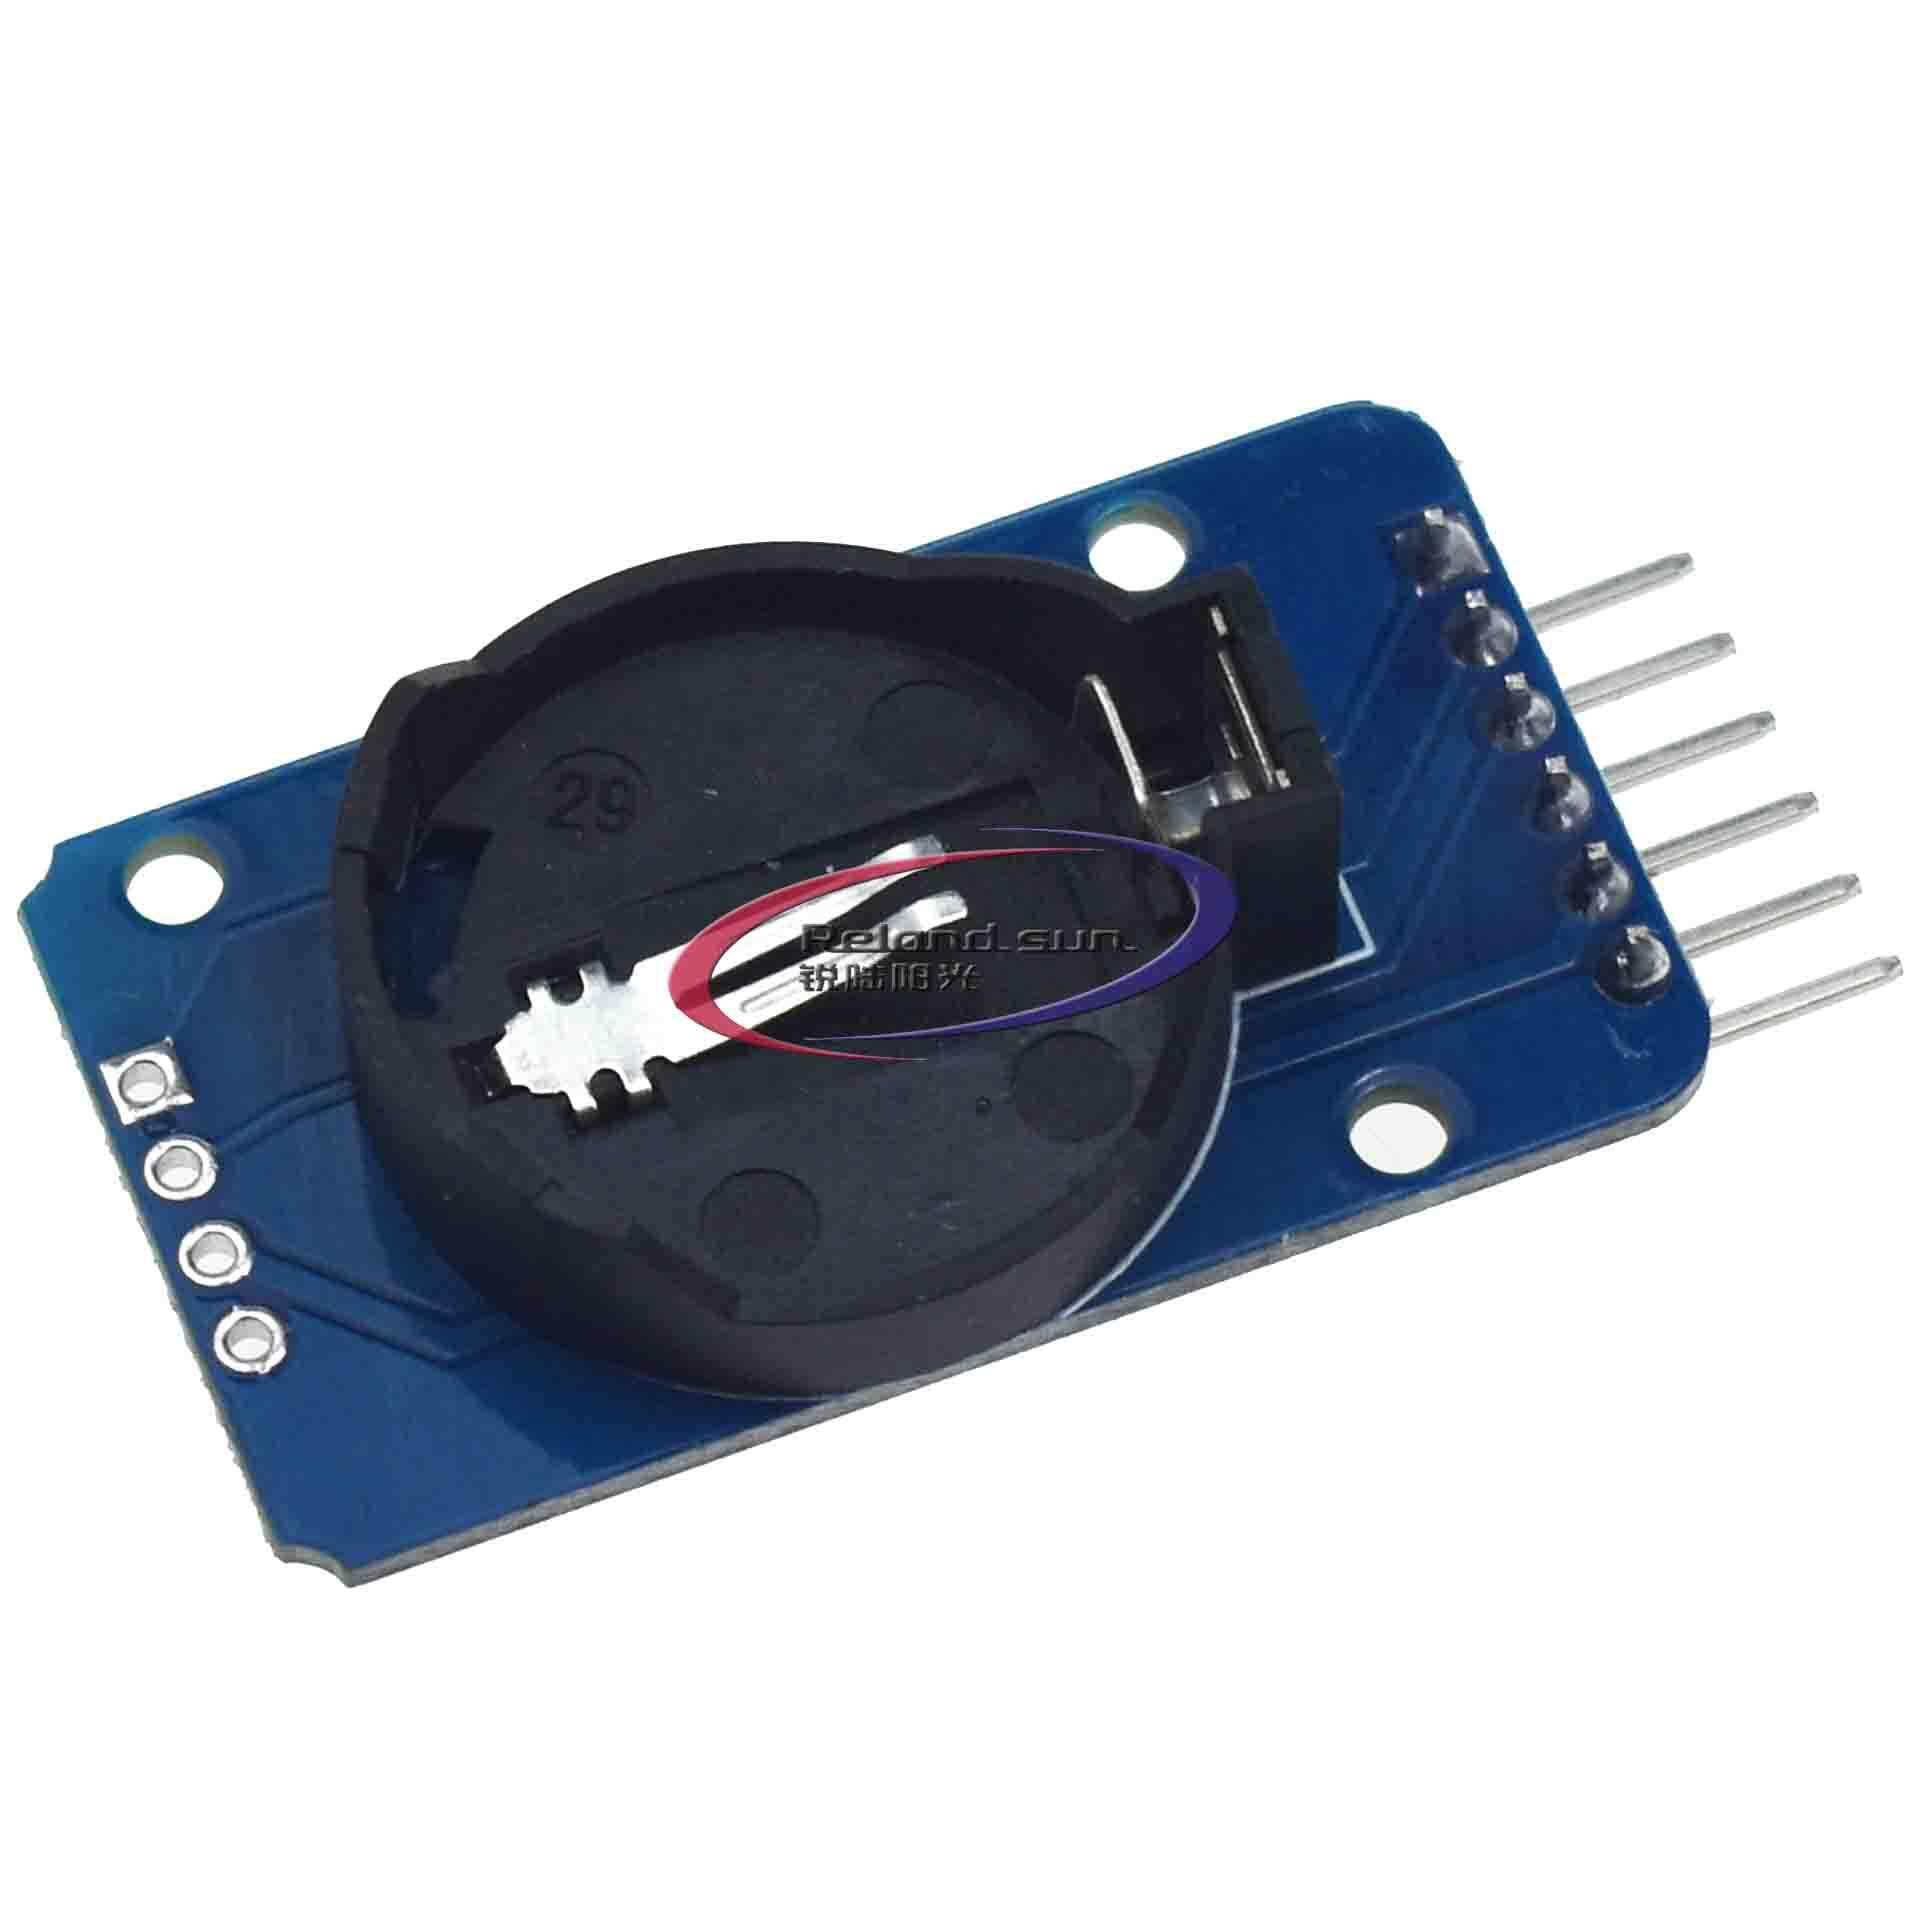 5pcs DS3231 AT24C32 IIC precision Real time clock module memory module